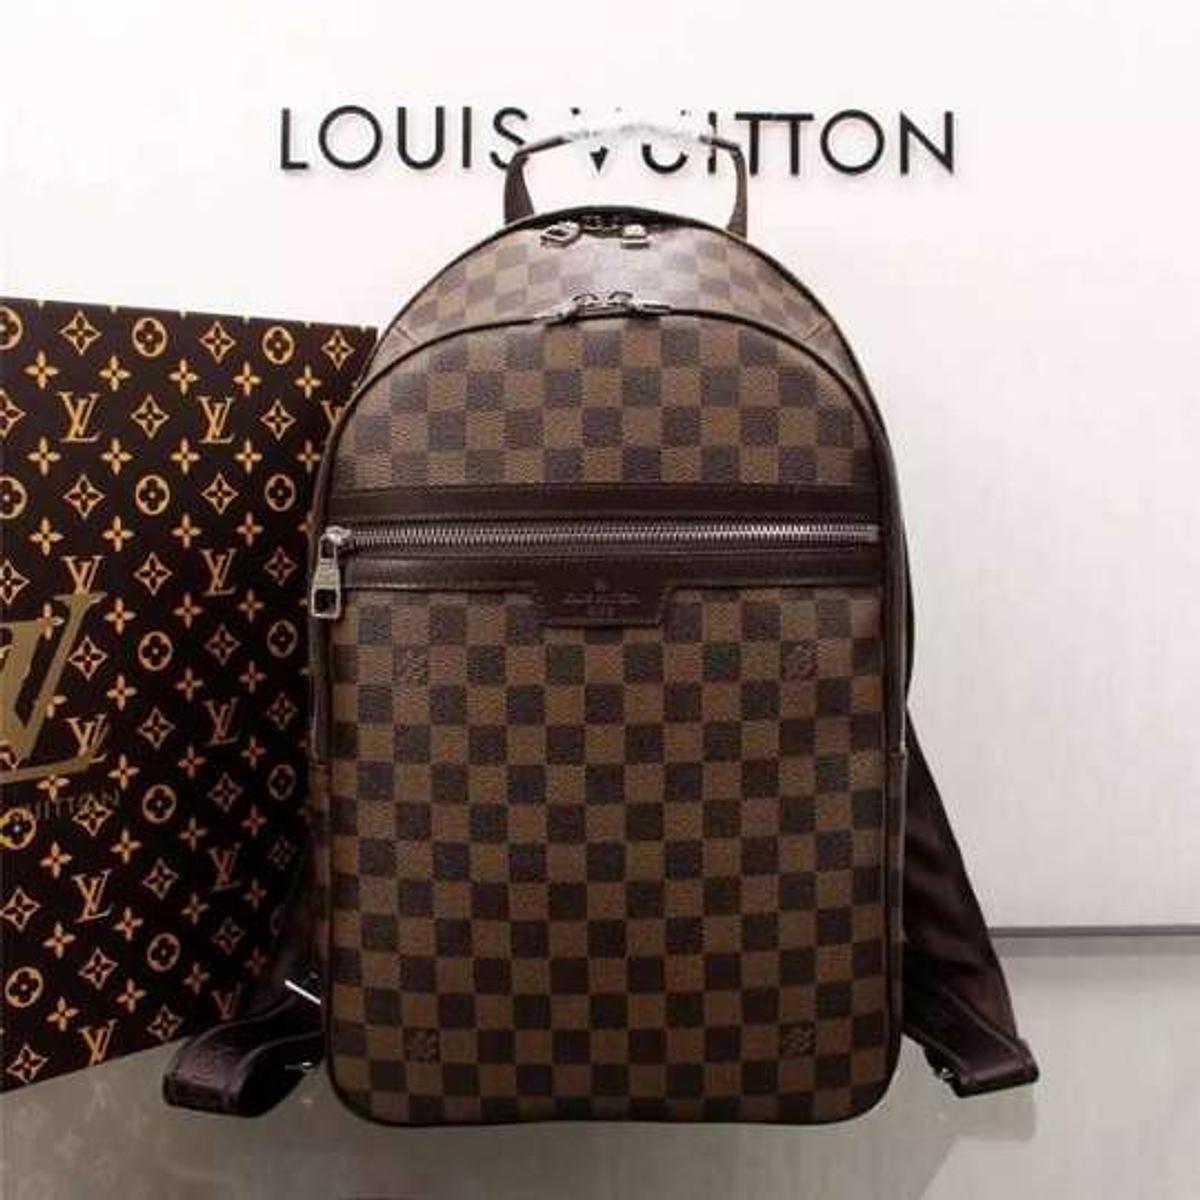 ccb76f4d1 Mochila Louis Vuitton